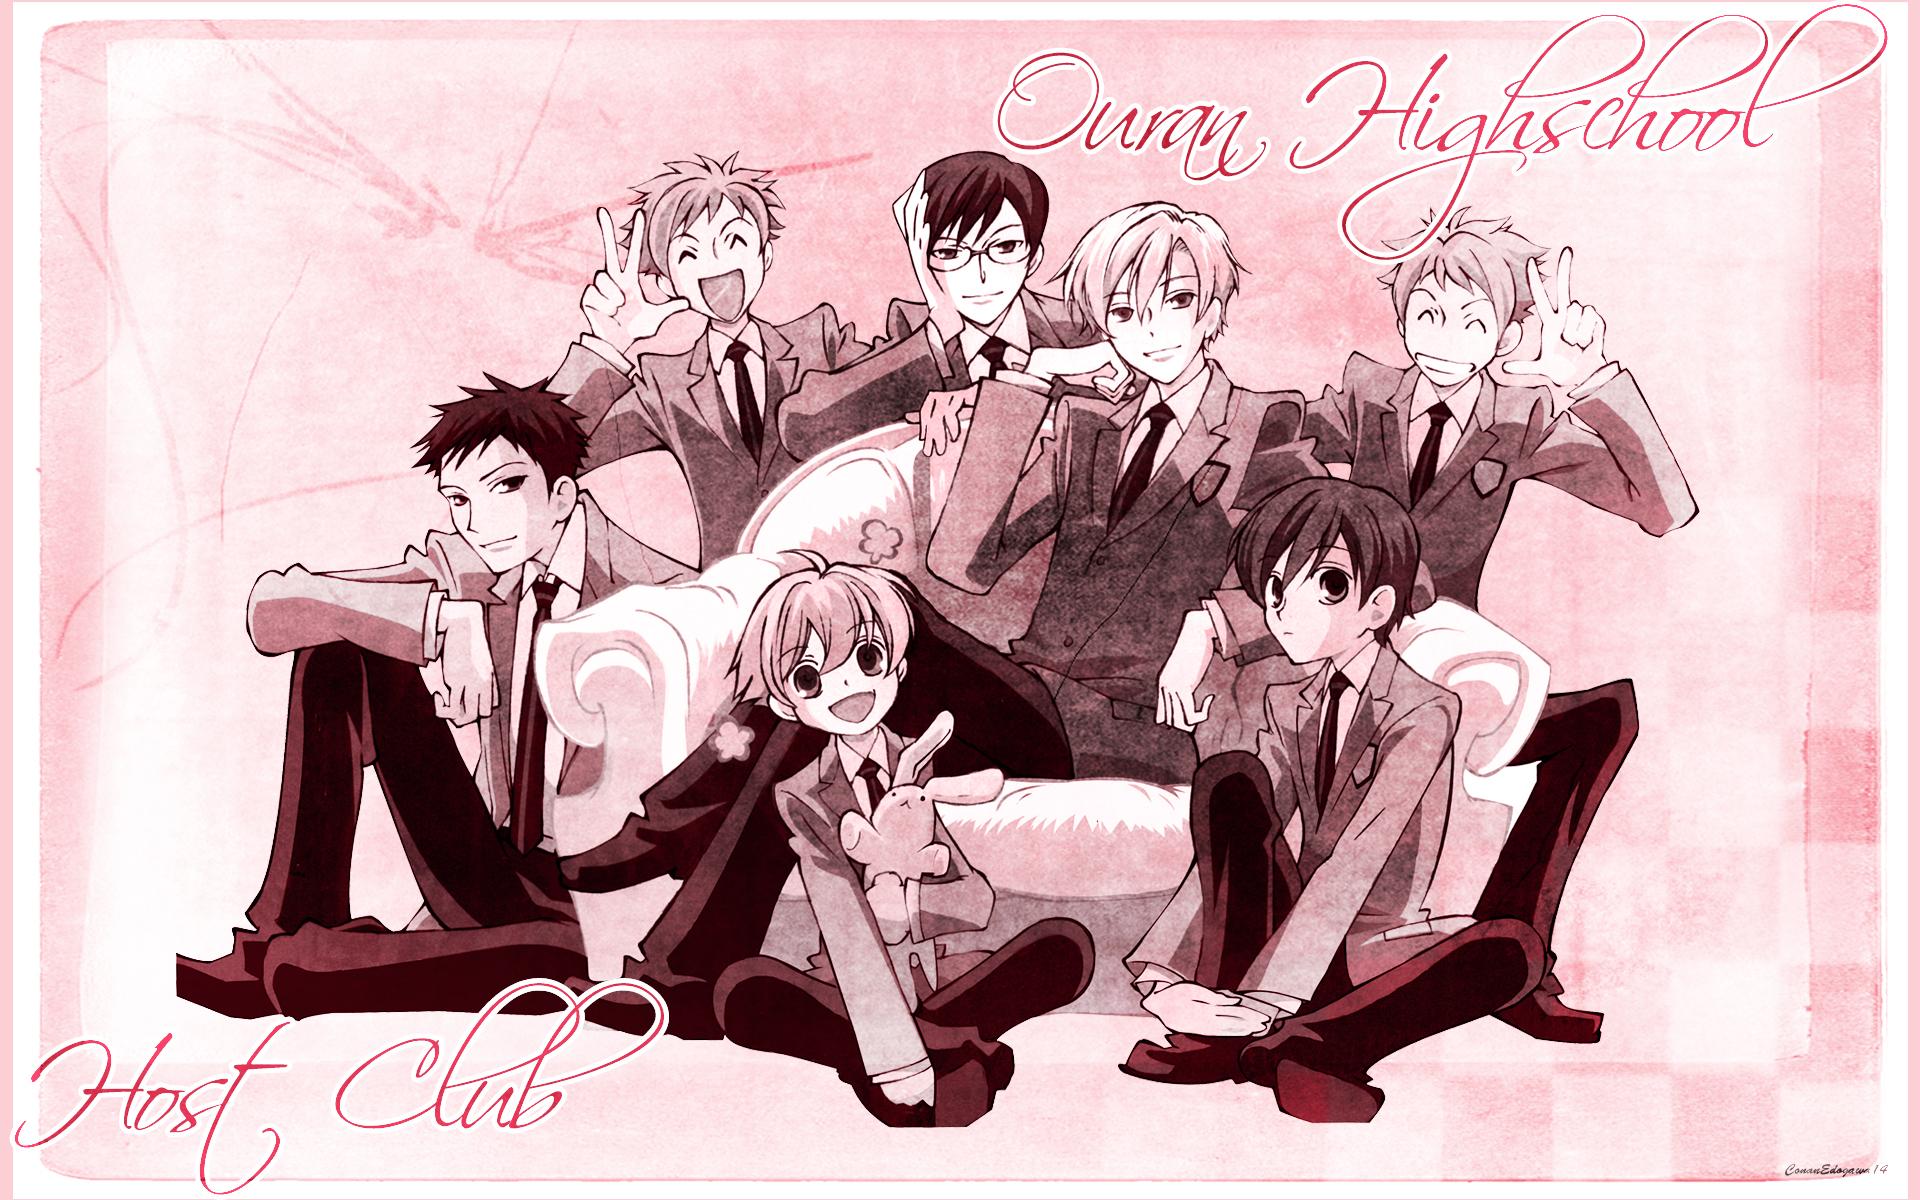 Wallpaper Hikaru Hitachiin